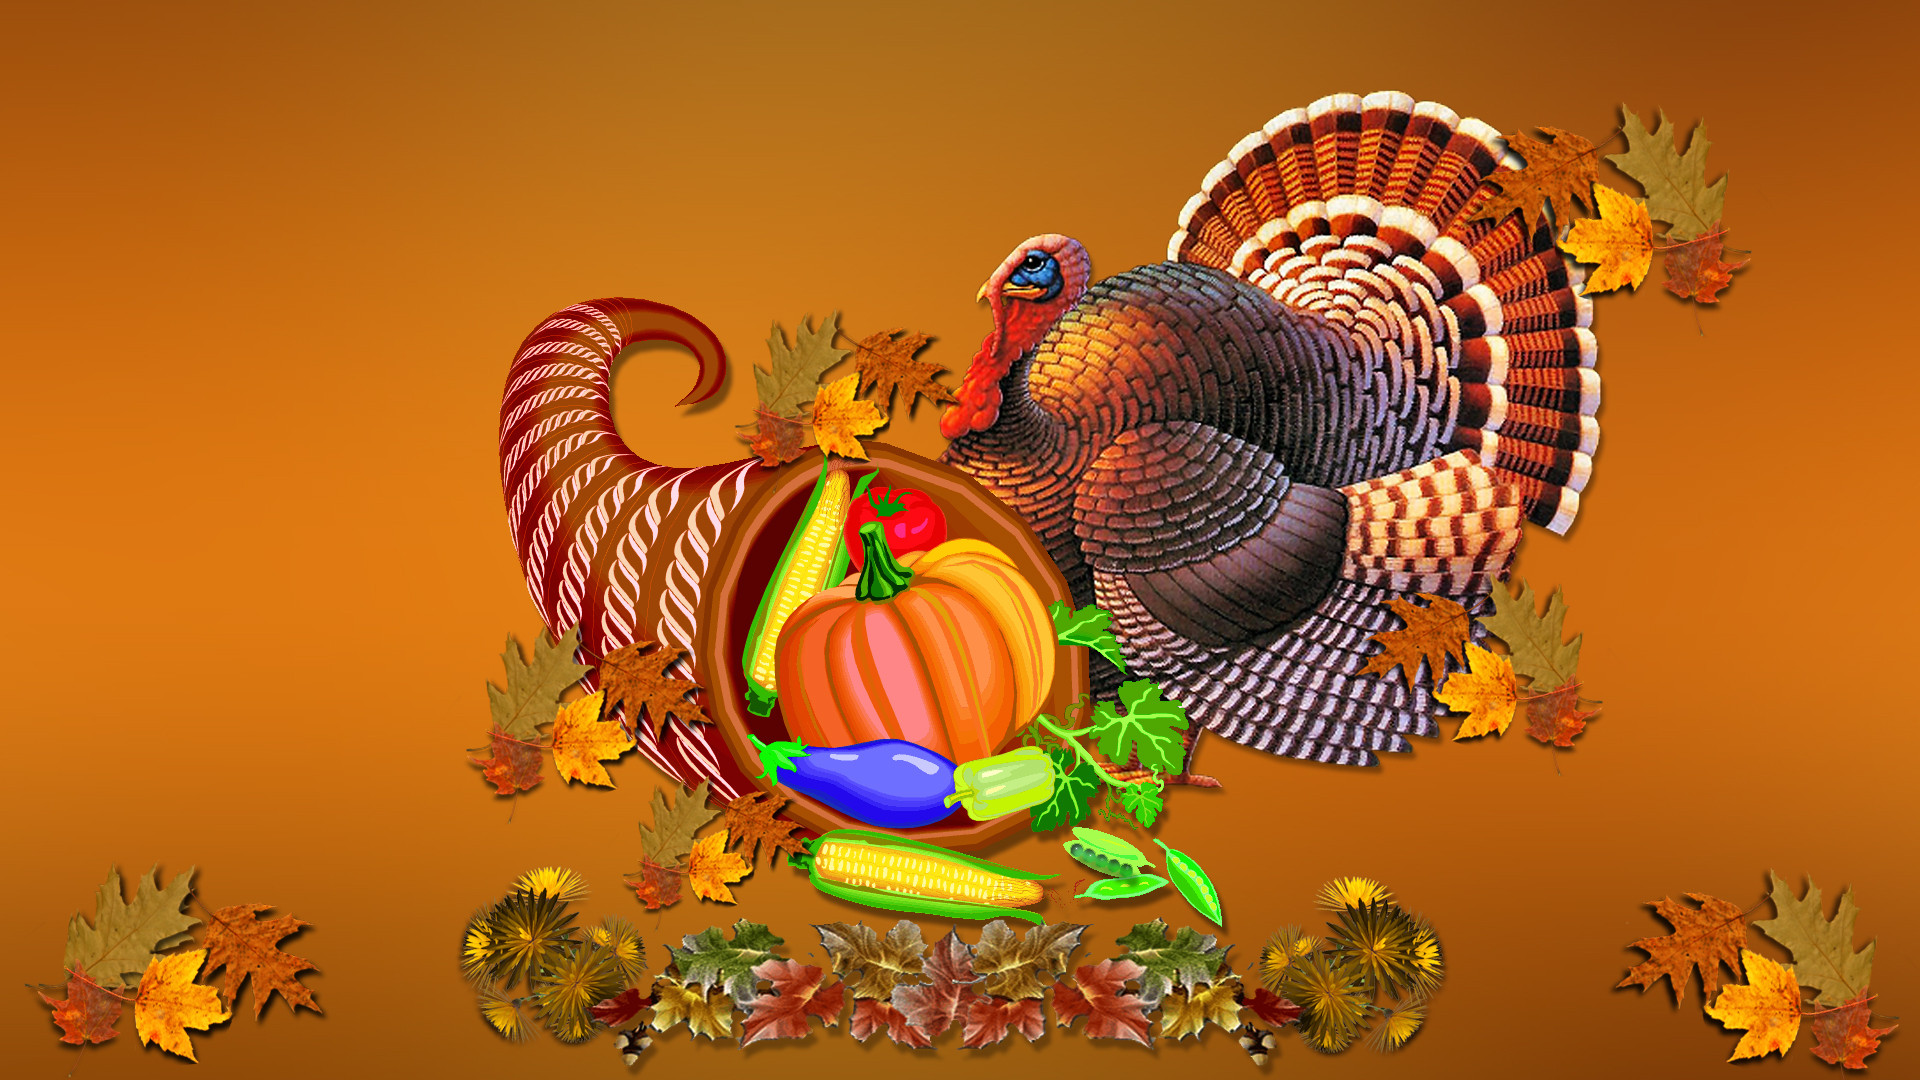 Thanksgiving Turkey Wallpaper  25 Happy Thanksgiving Day 2012 HD Wallpapers – Designbolts